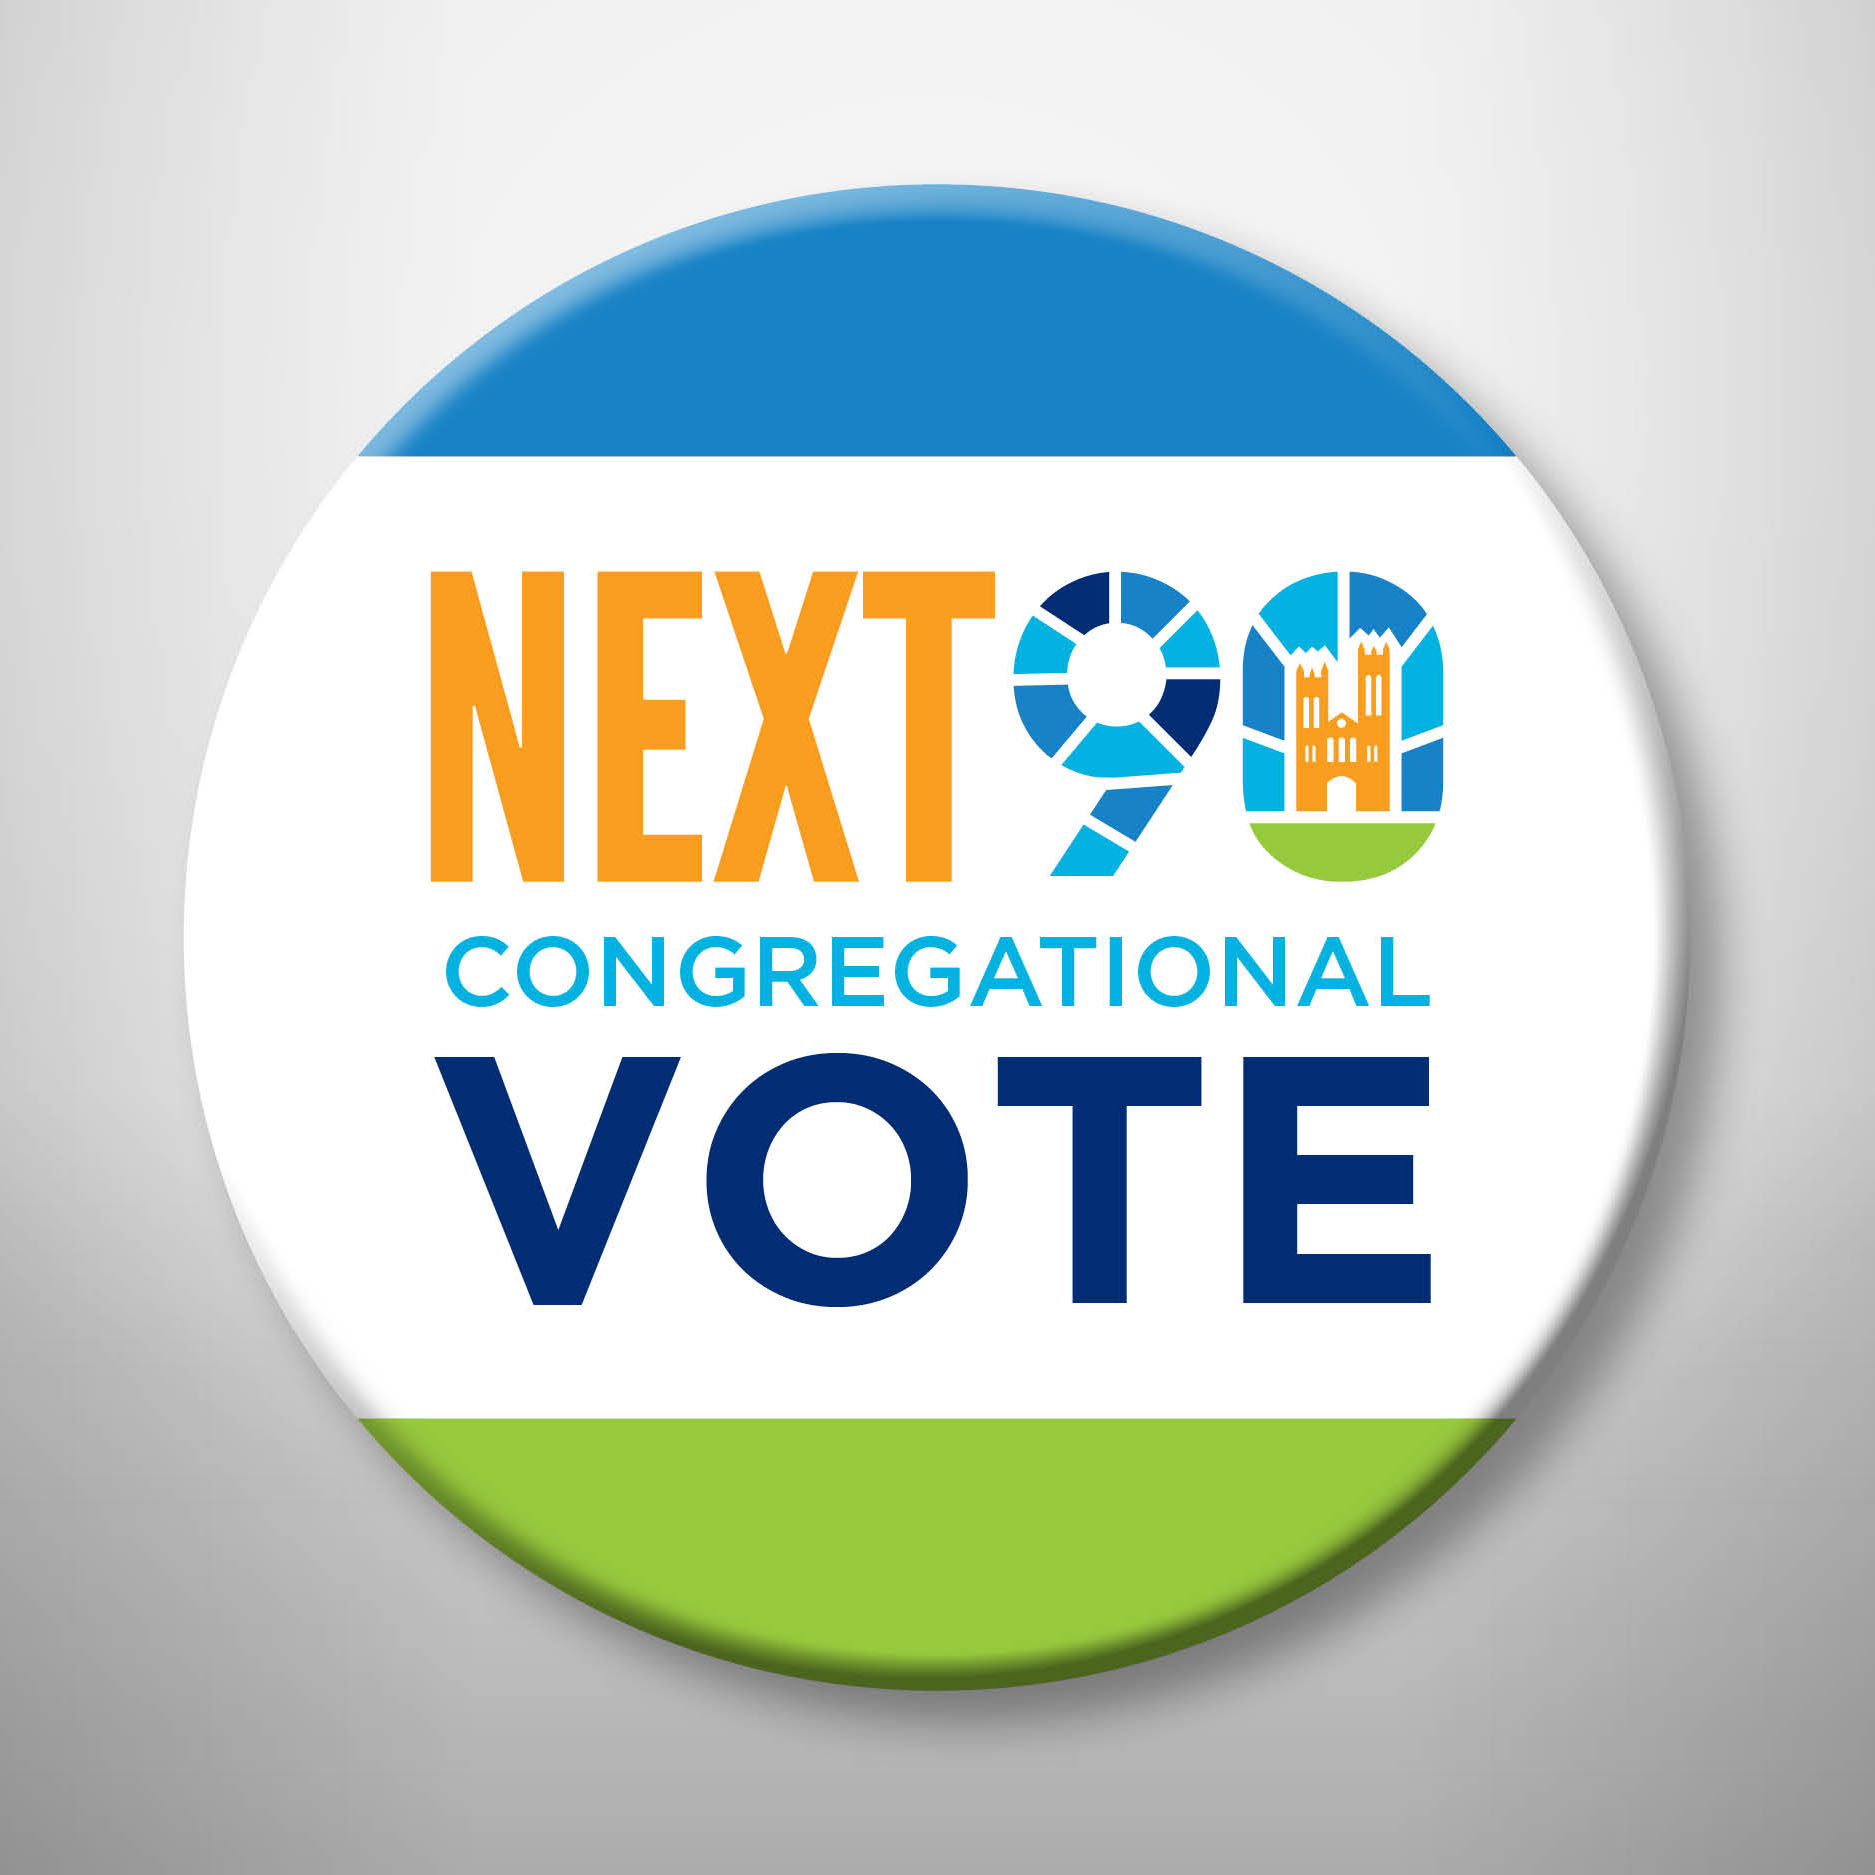 Next90 Vote Scheduled for September 13!